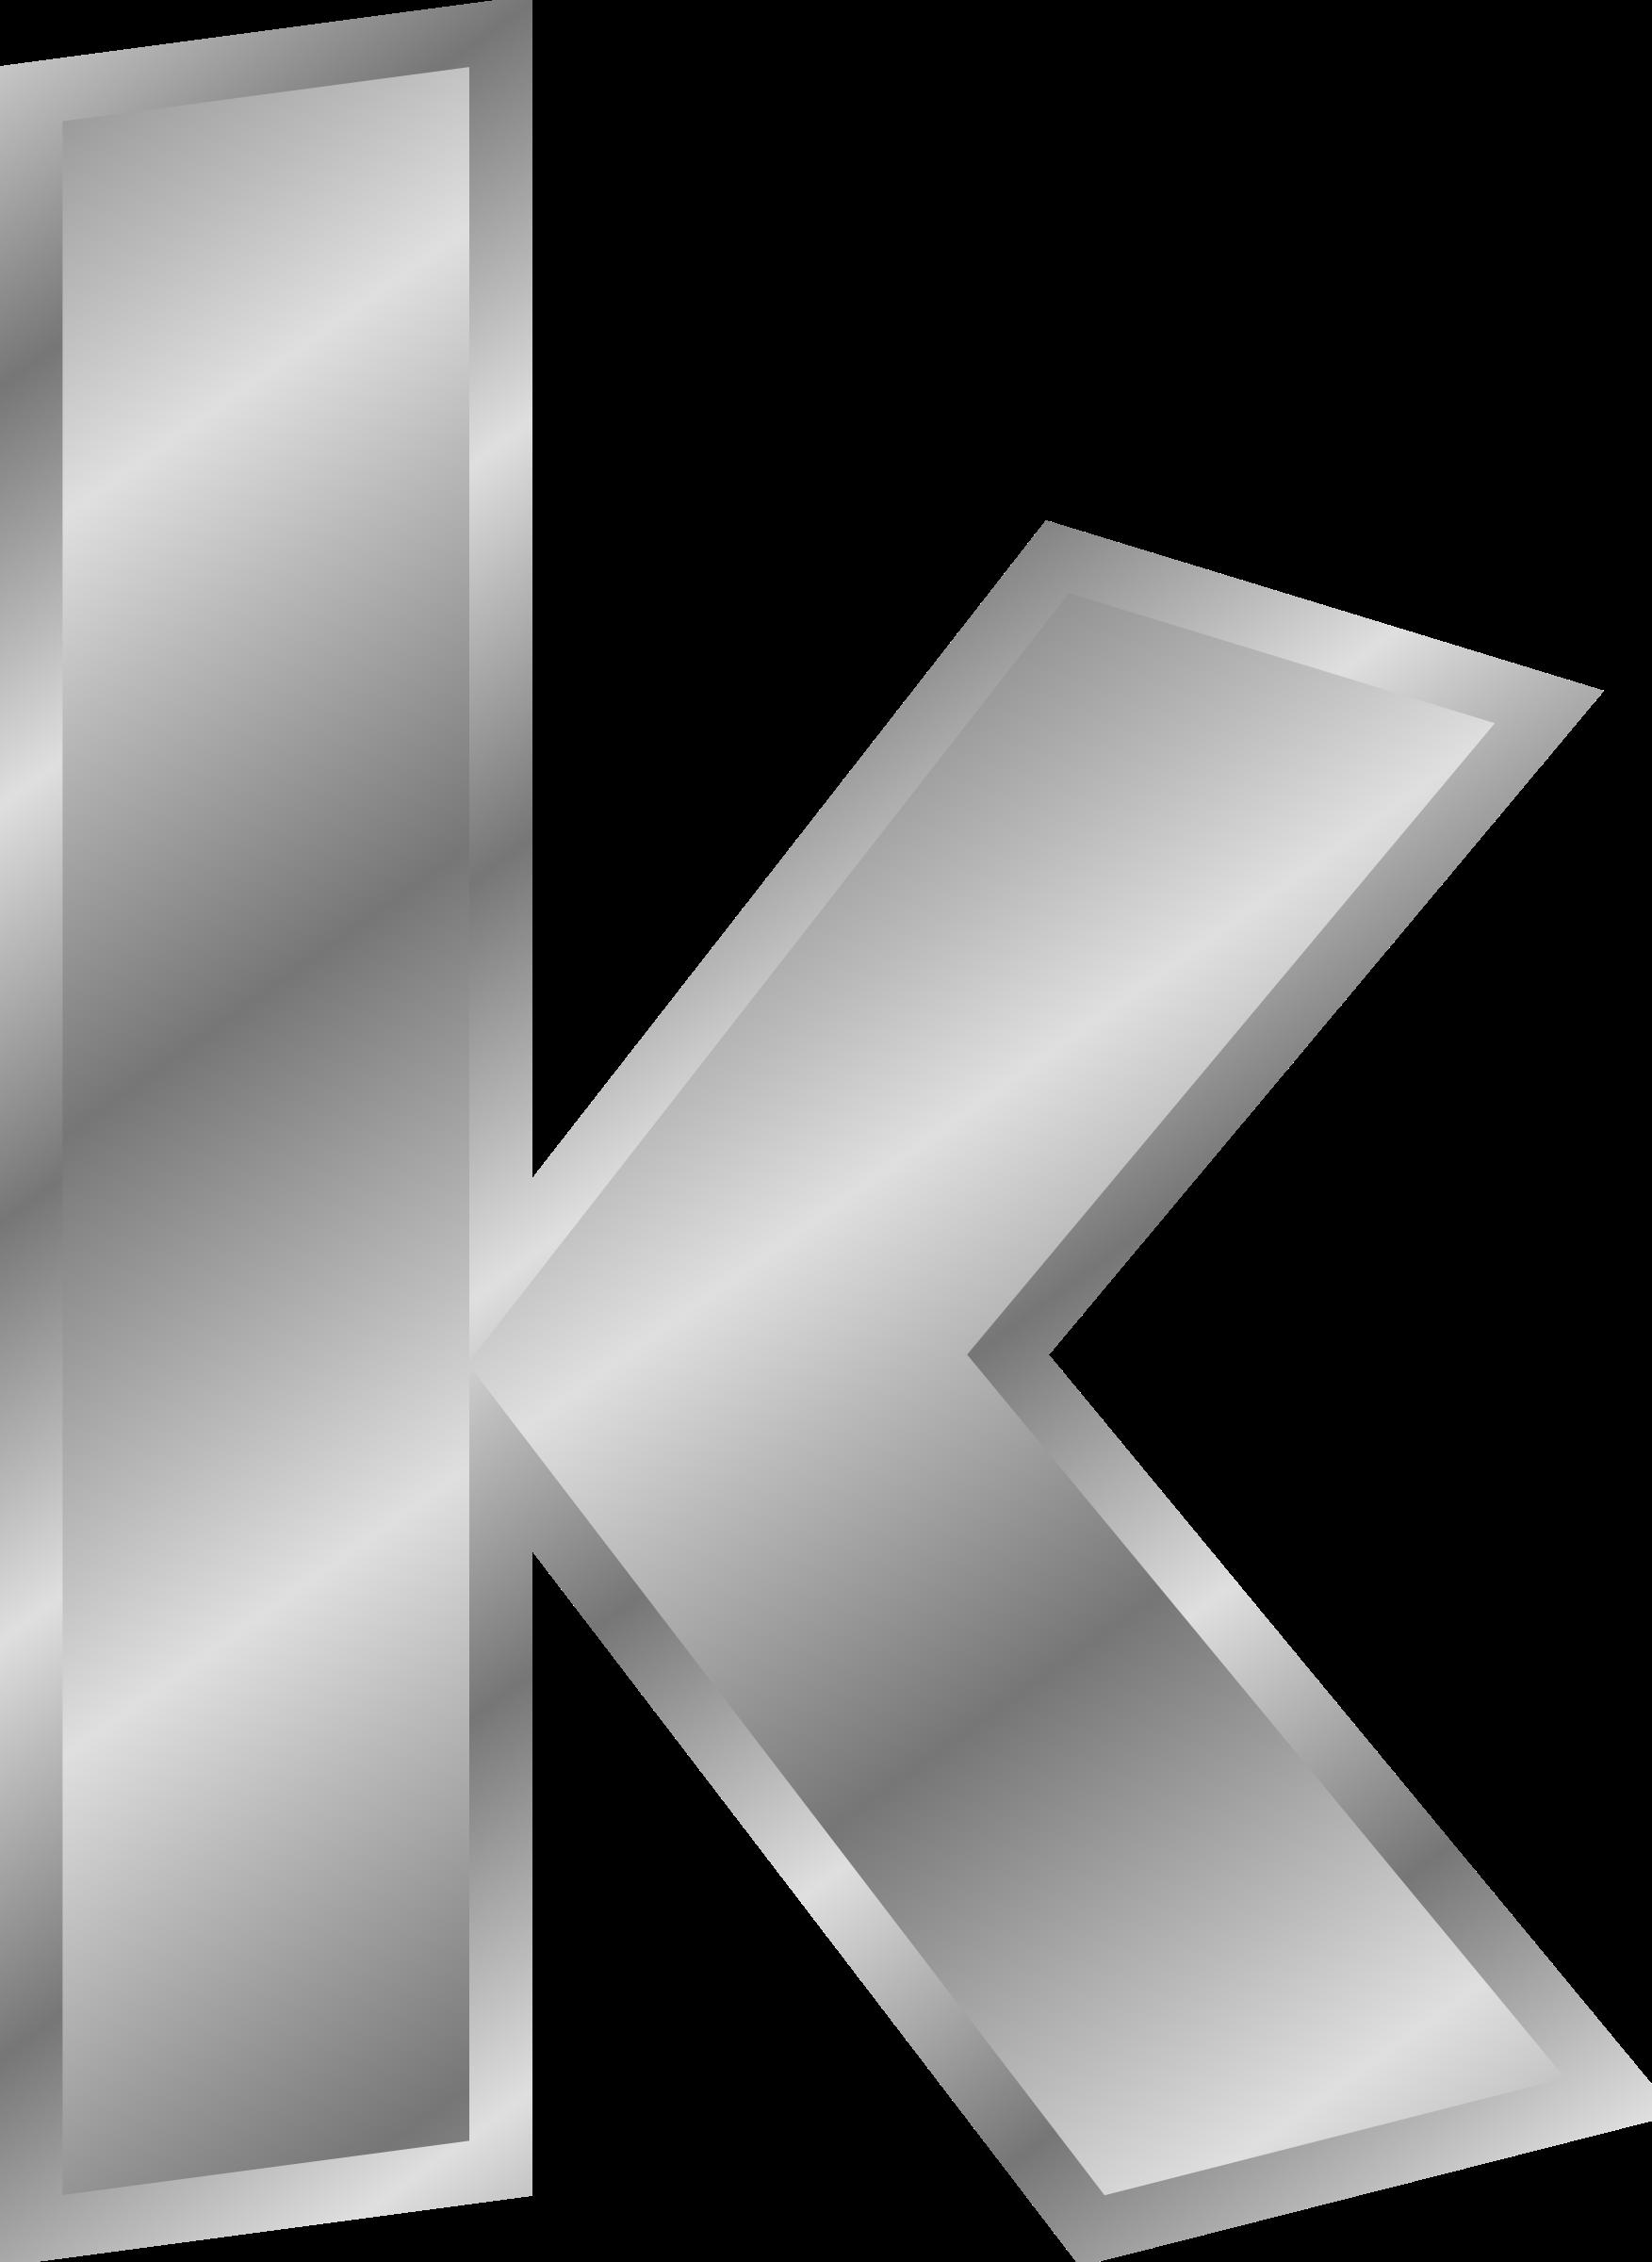 Effect Letter K Png Image Png Images Alphabet Photos Alphabet Images